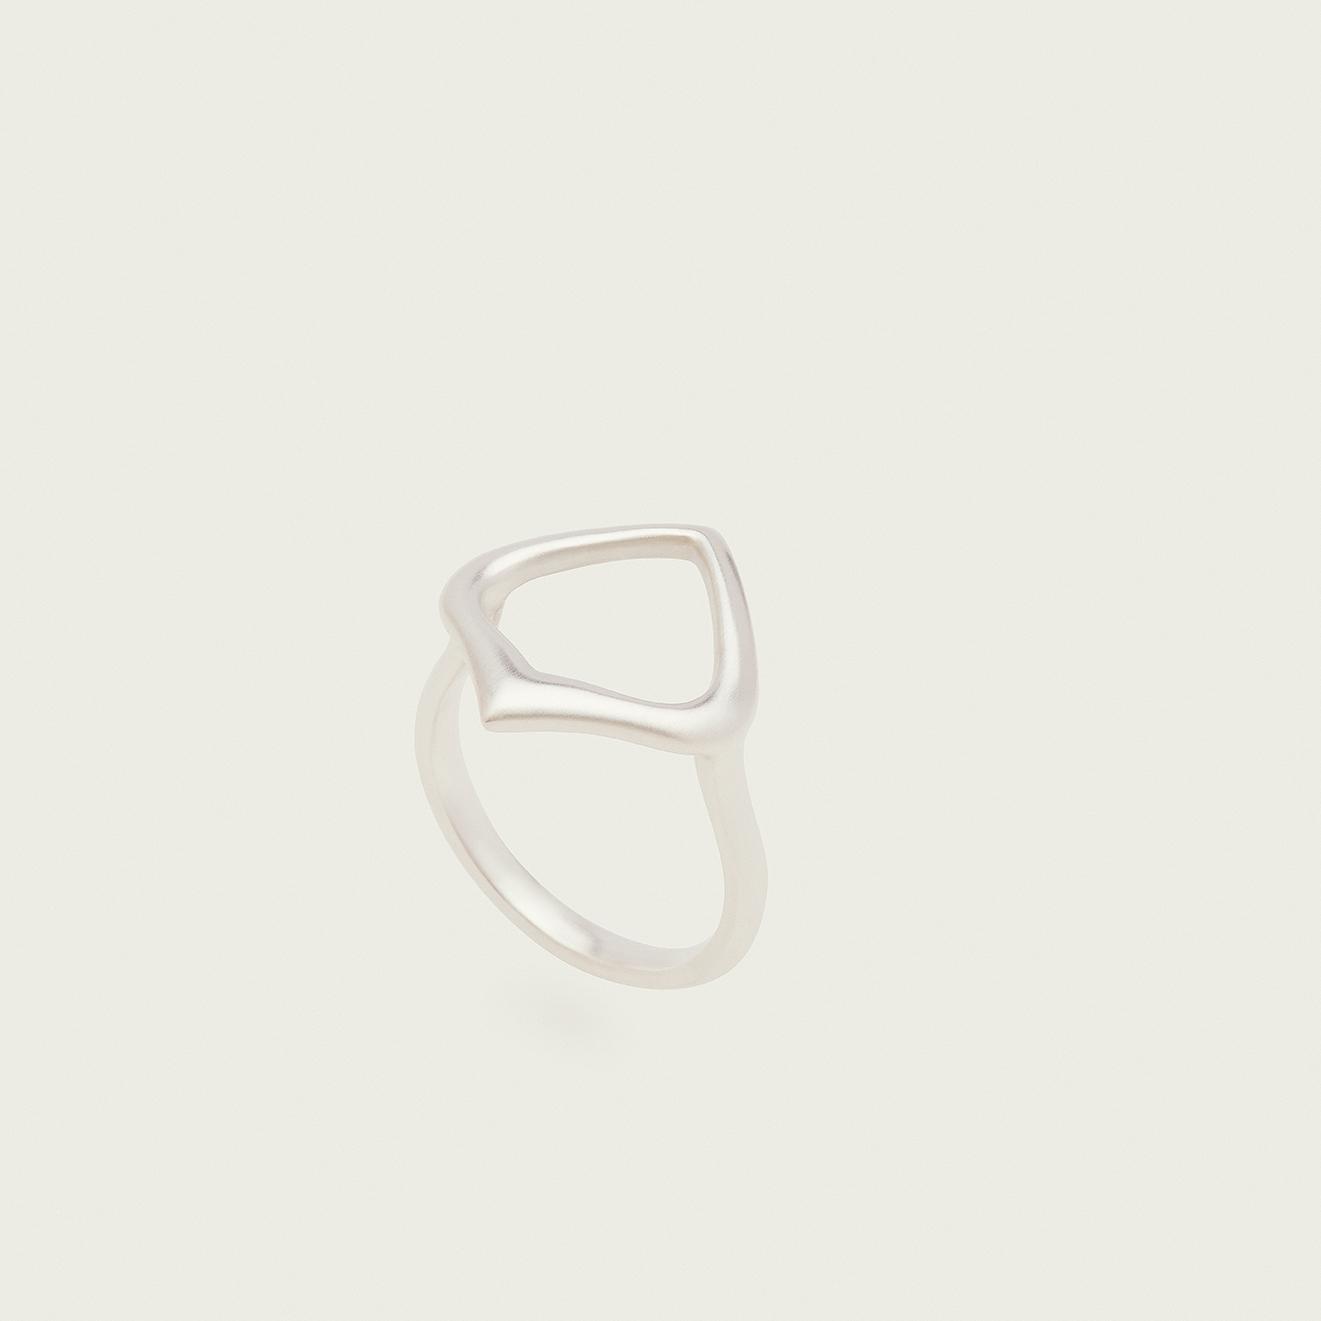 Moznabi Jewellery – Essence of Persia – Silver Ring